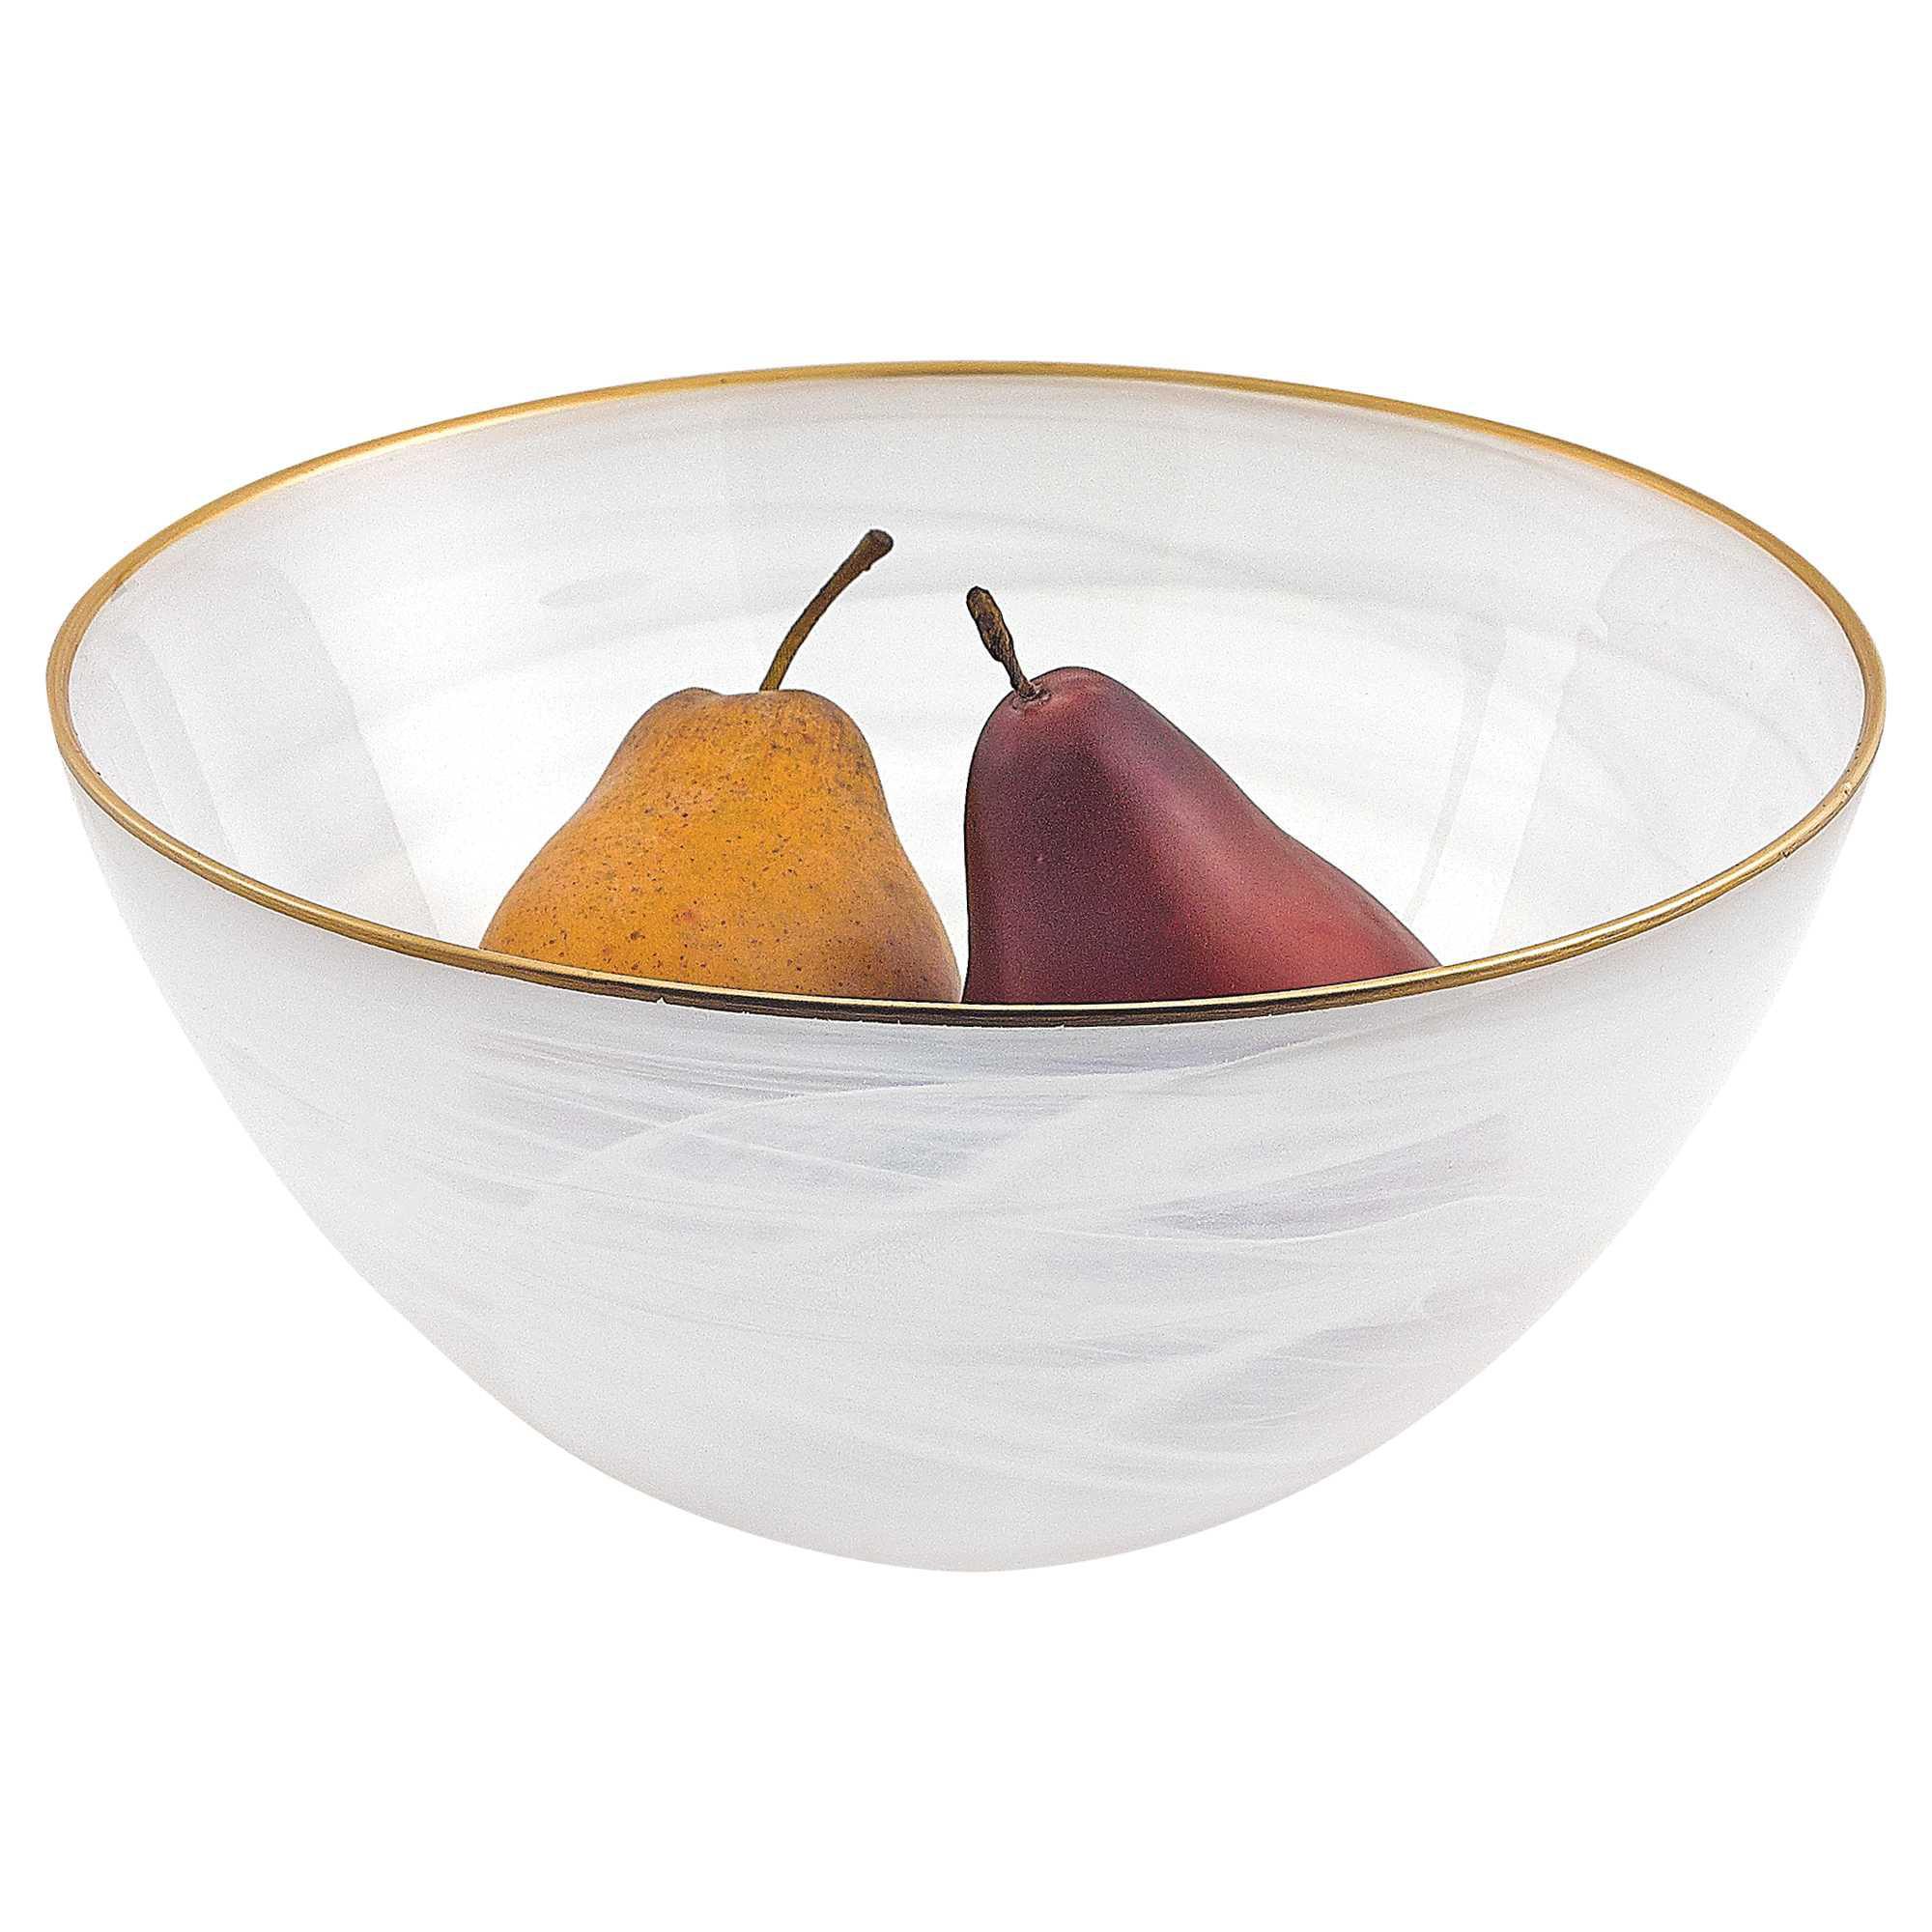 10 Hand Crafted White Gold Glass Fruit Or Salad Bowl With Gold Rim Walmart Com Walmart Com